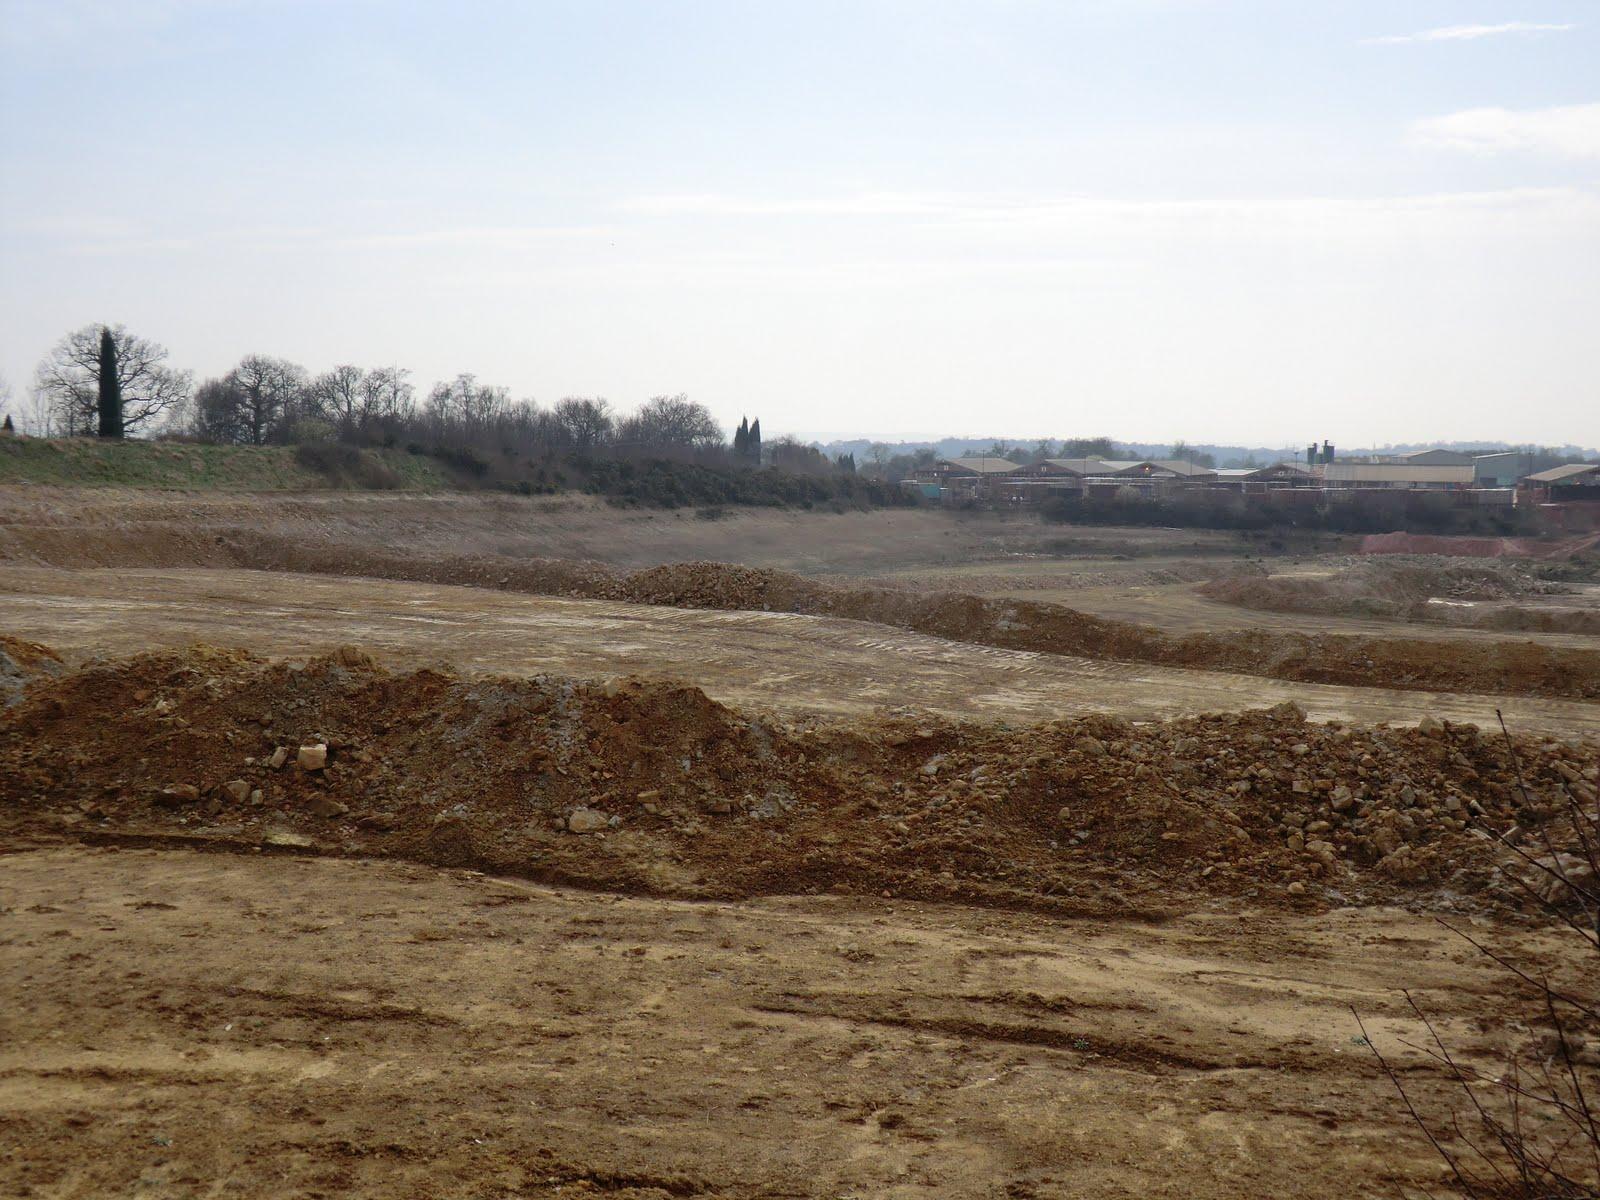 CIMG1932 Freshfield Brickworks and clay pit